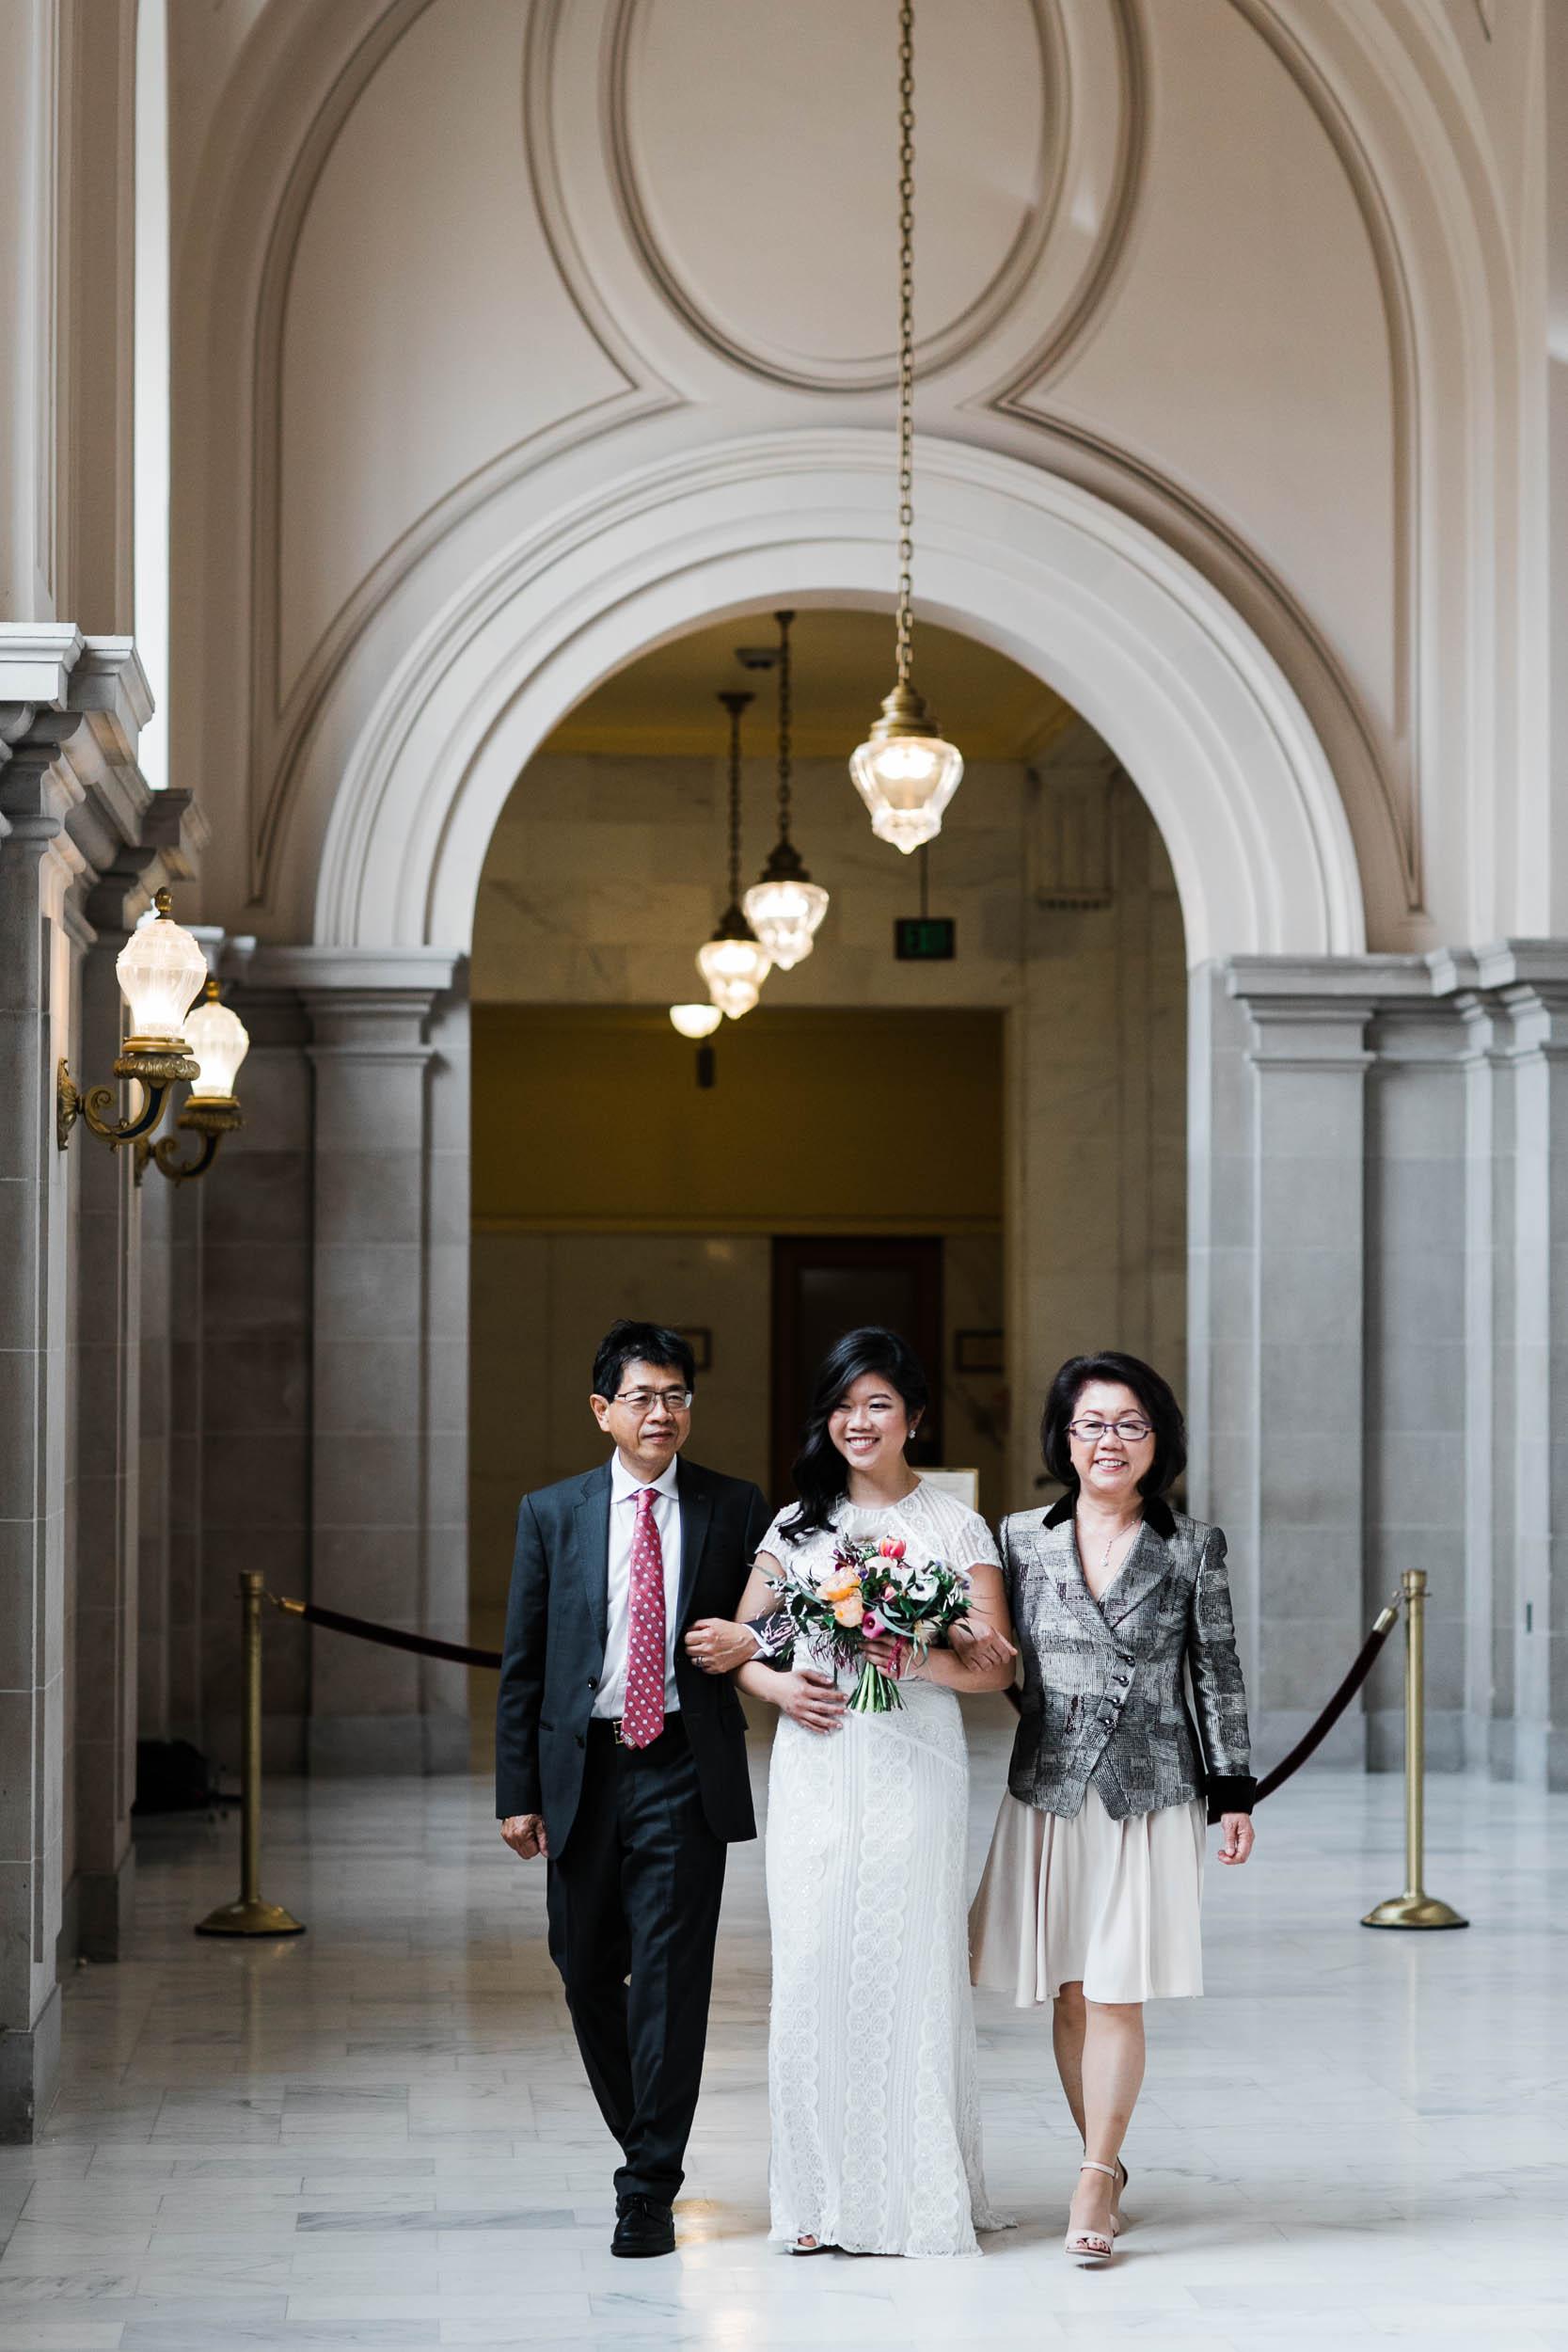 032118_M+D City Hall Wedding_Buena Lane Photography_0614.jpg